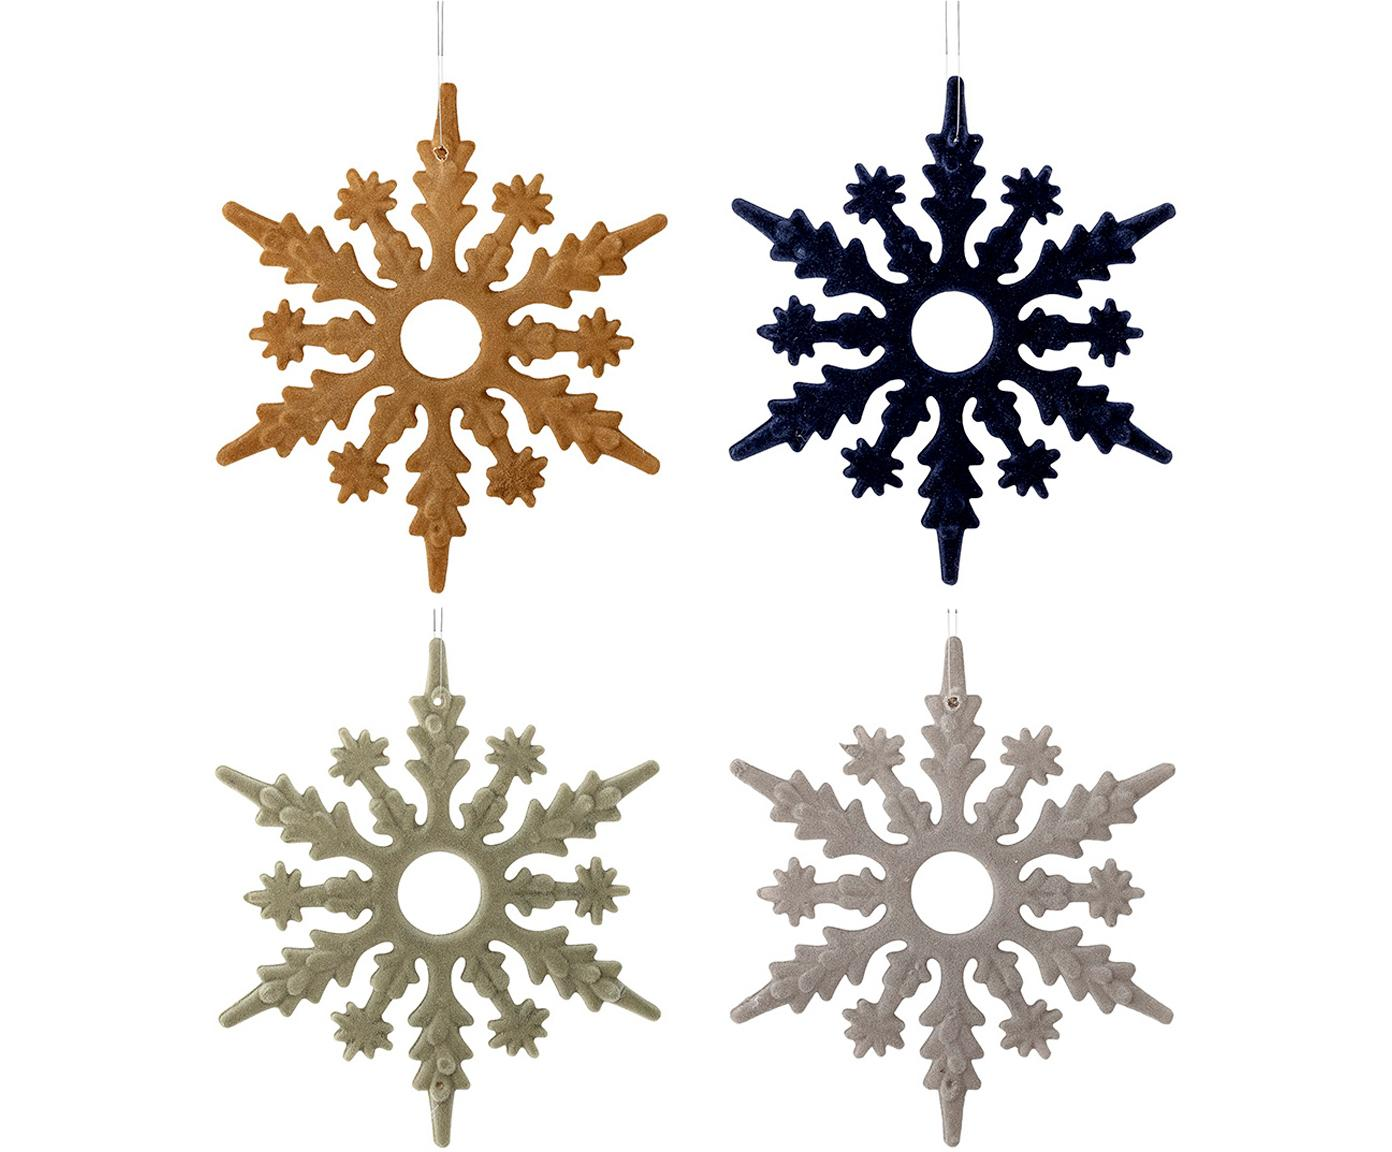 Baumanhänger-Set Snowflakes, 4-tlg., Polypropylen, Polyester, Senfgelb, Dunkelblau, Mintgrün, Grau, Ø 15 cm